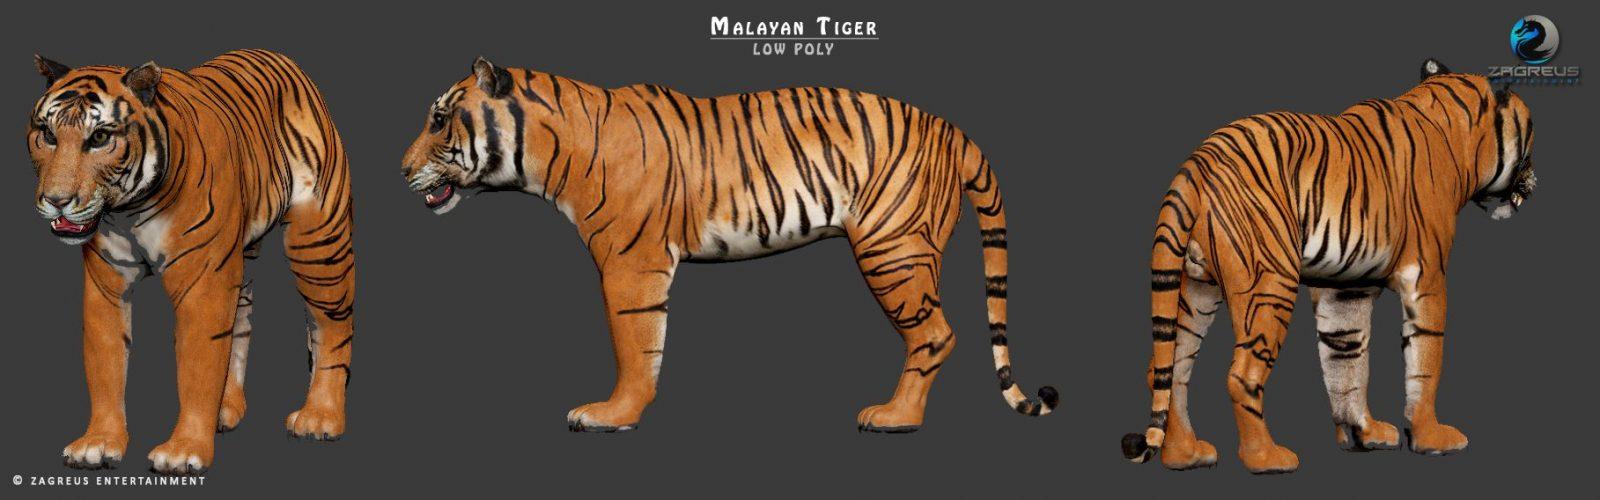 Malayan-Tiger-03_ZE.jpg